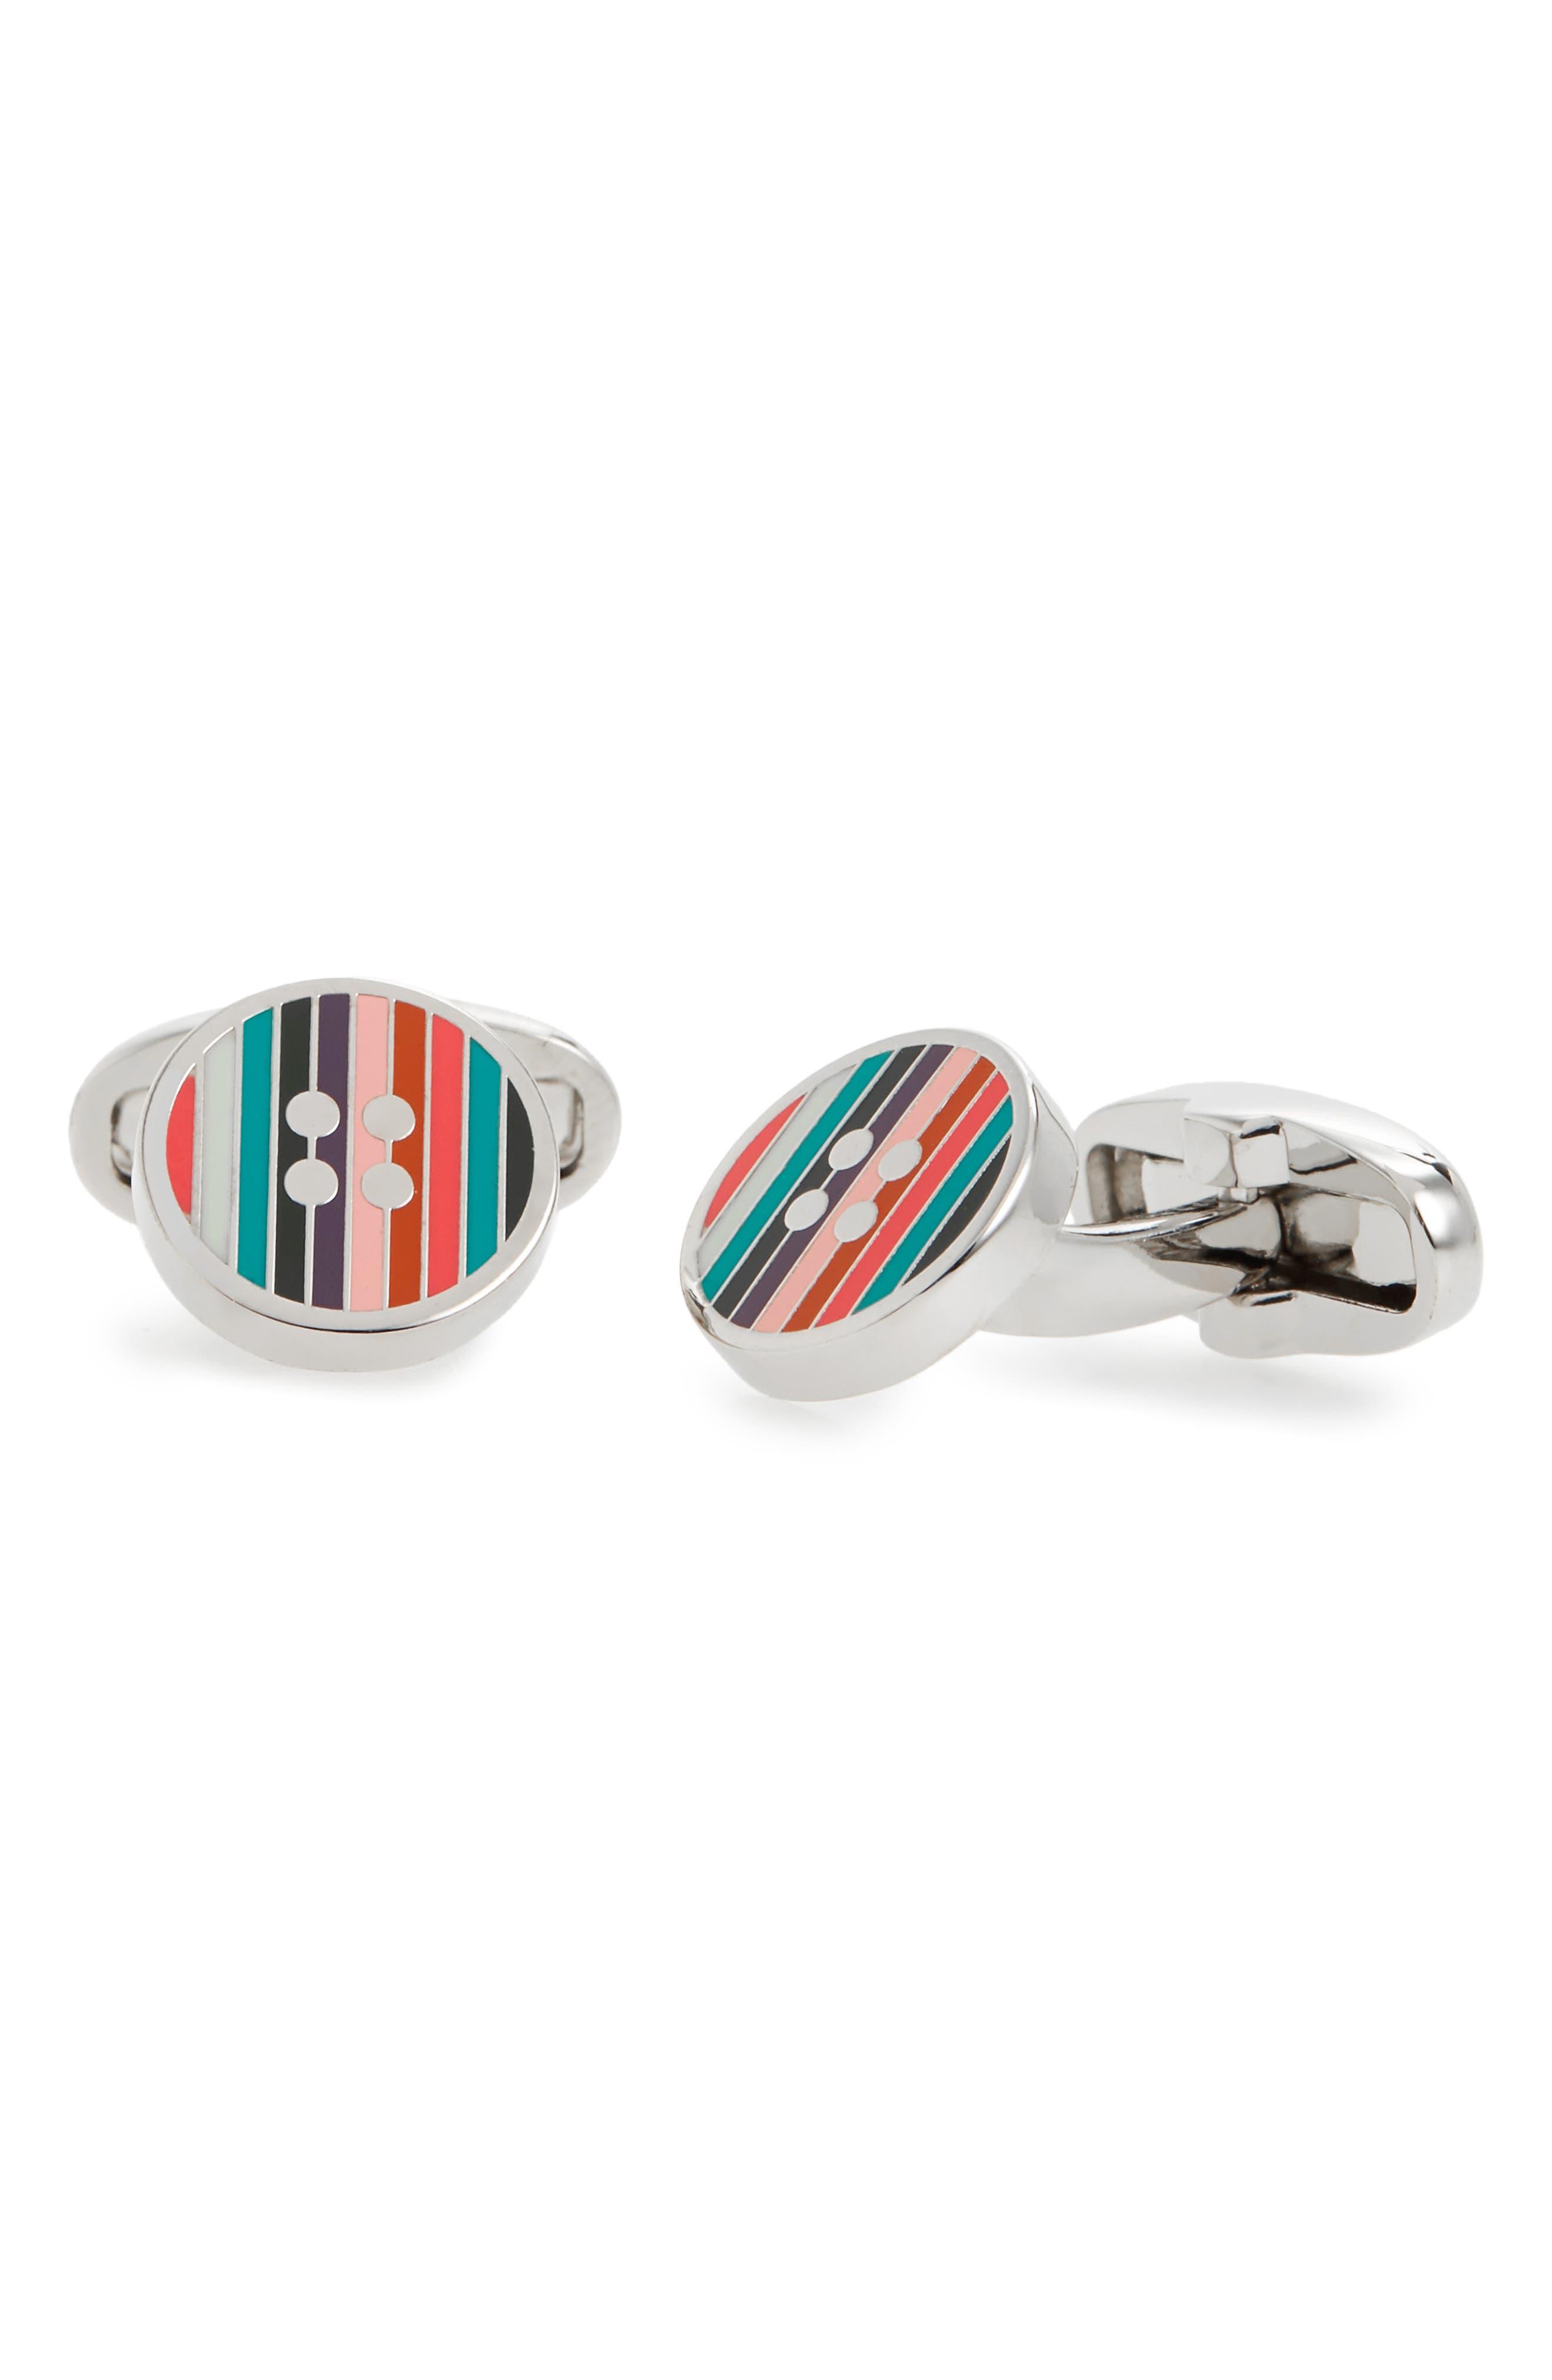 Enamel Button Cuff Links,                         Main,                         color, MULTI